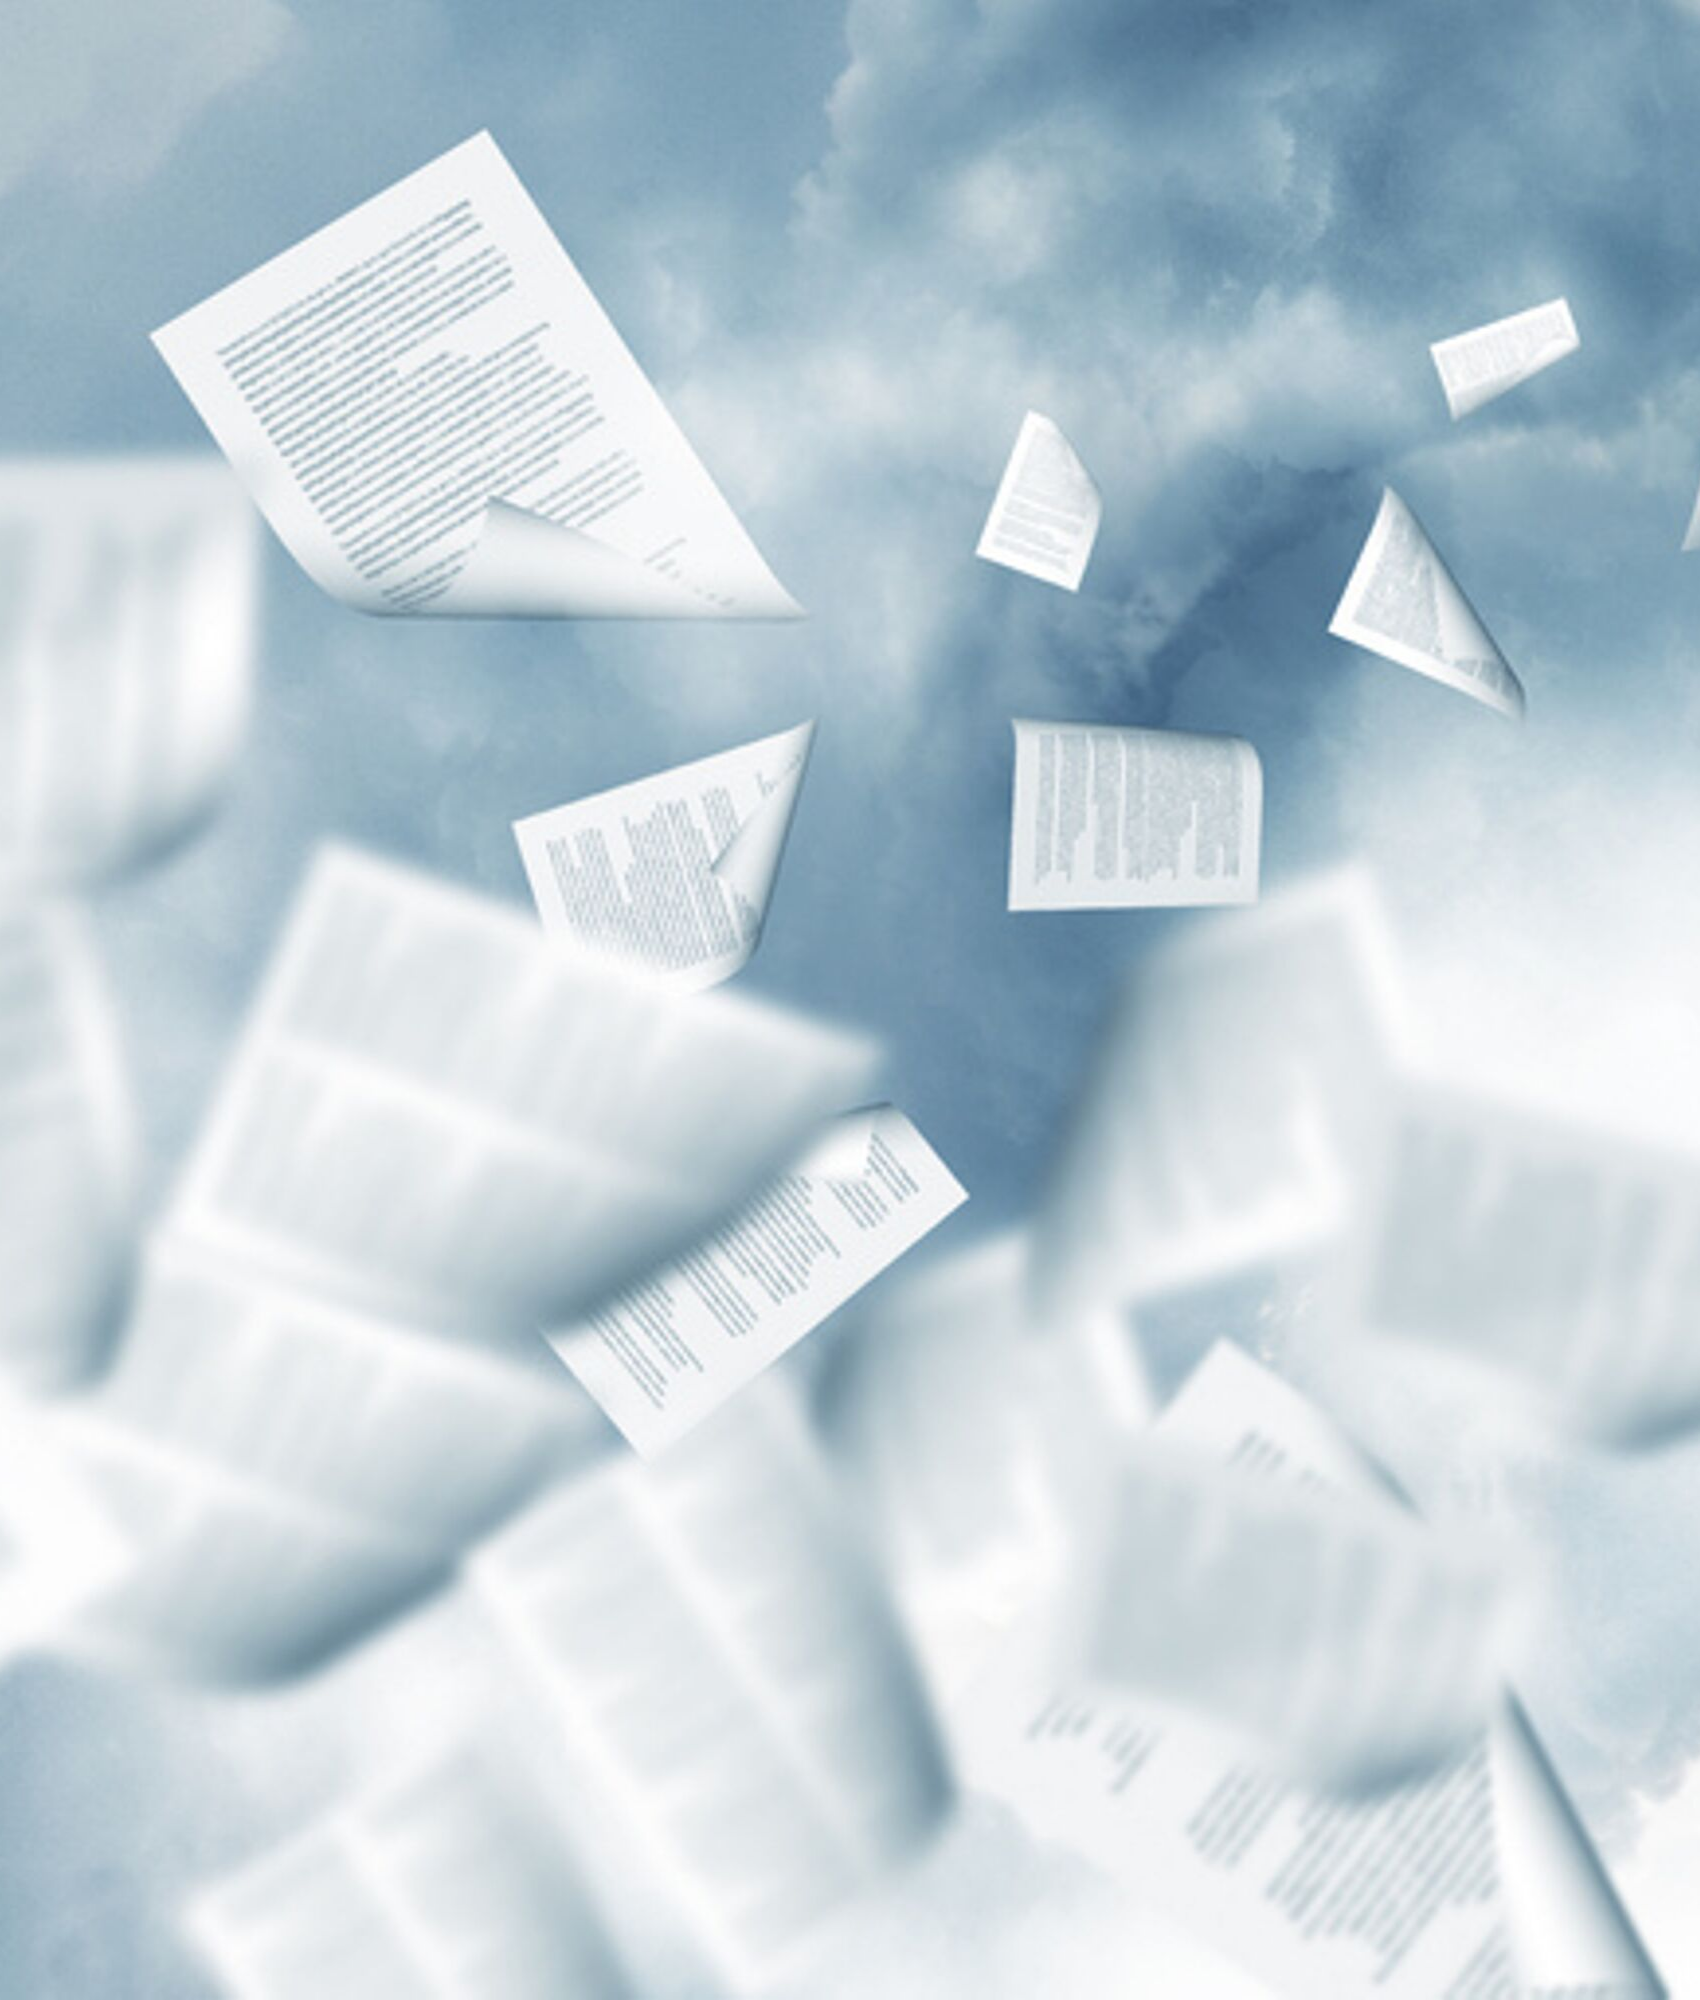 bulk-scan-paper